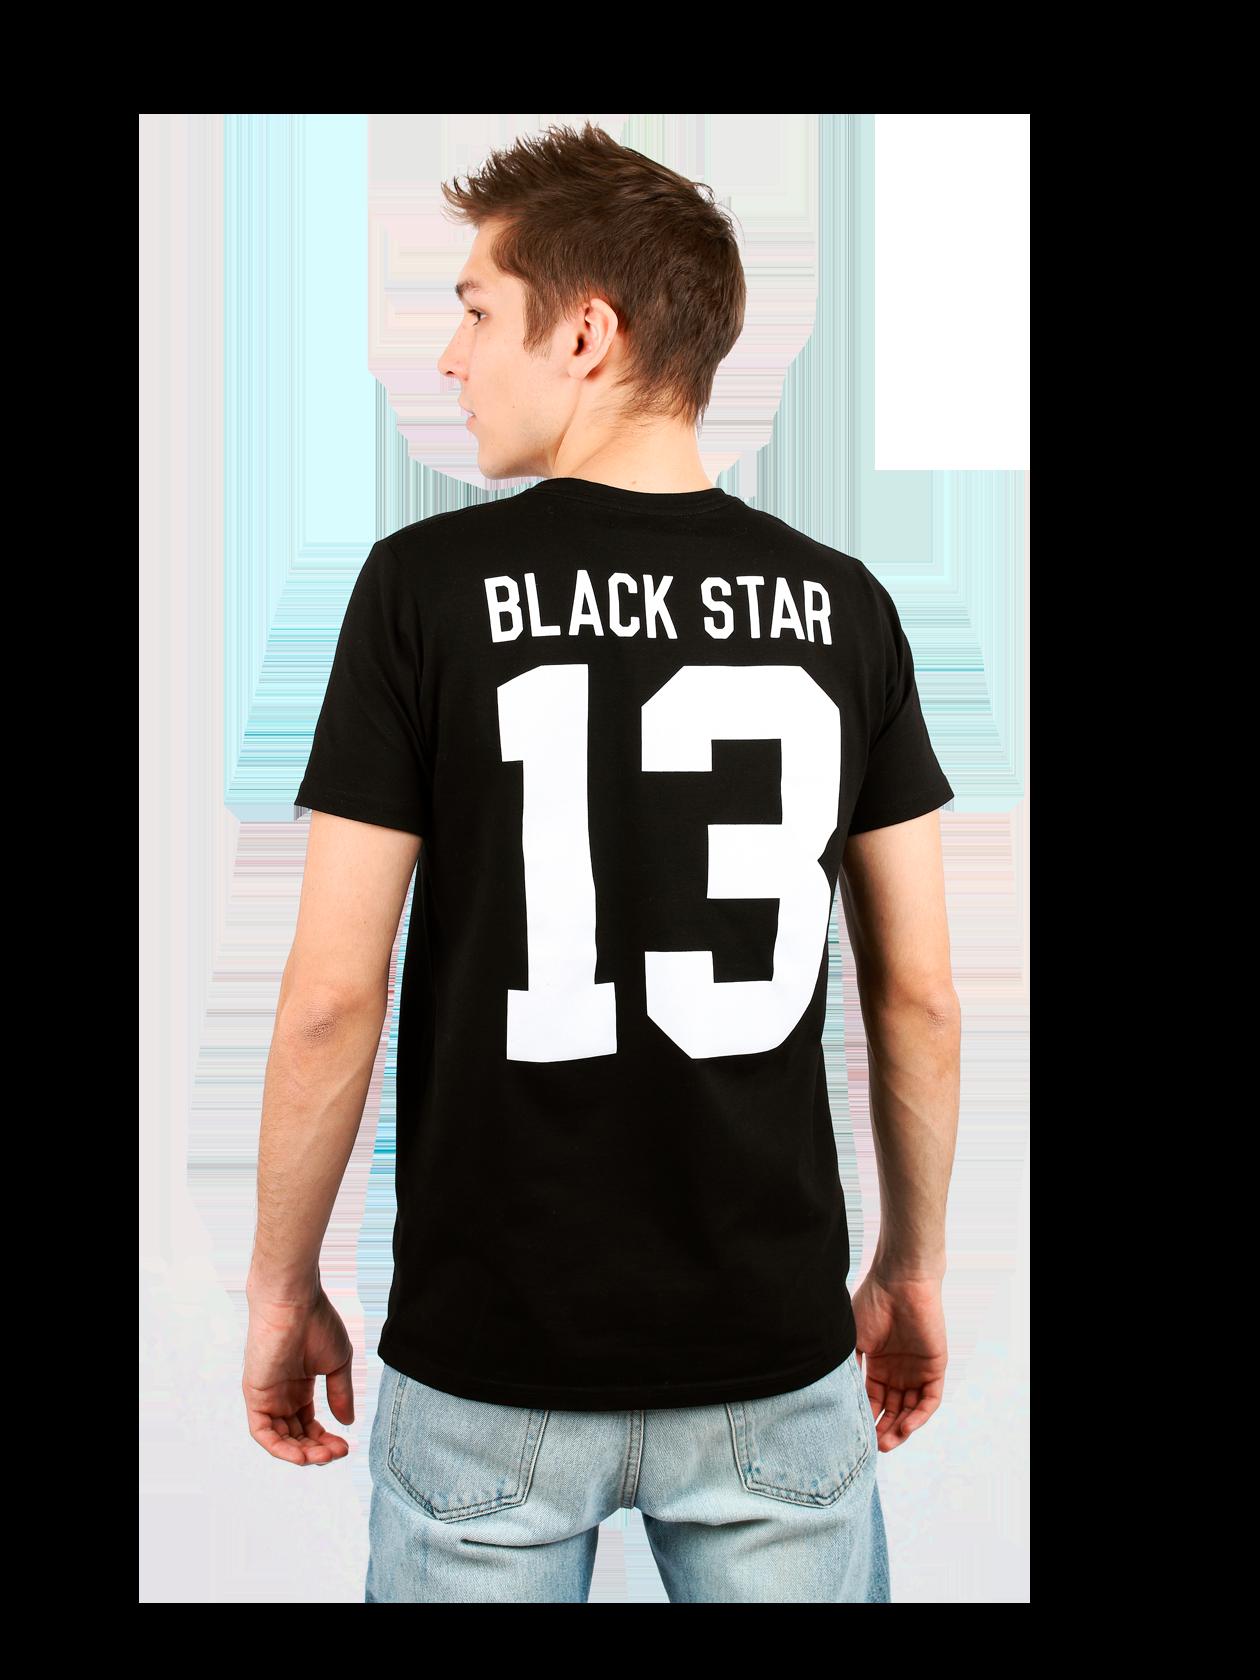 Футболка мужская BLACK STAR 13 от Black Star